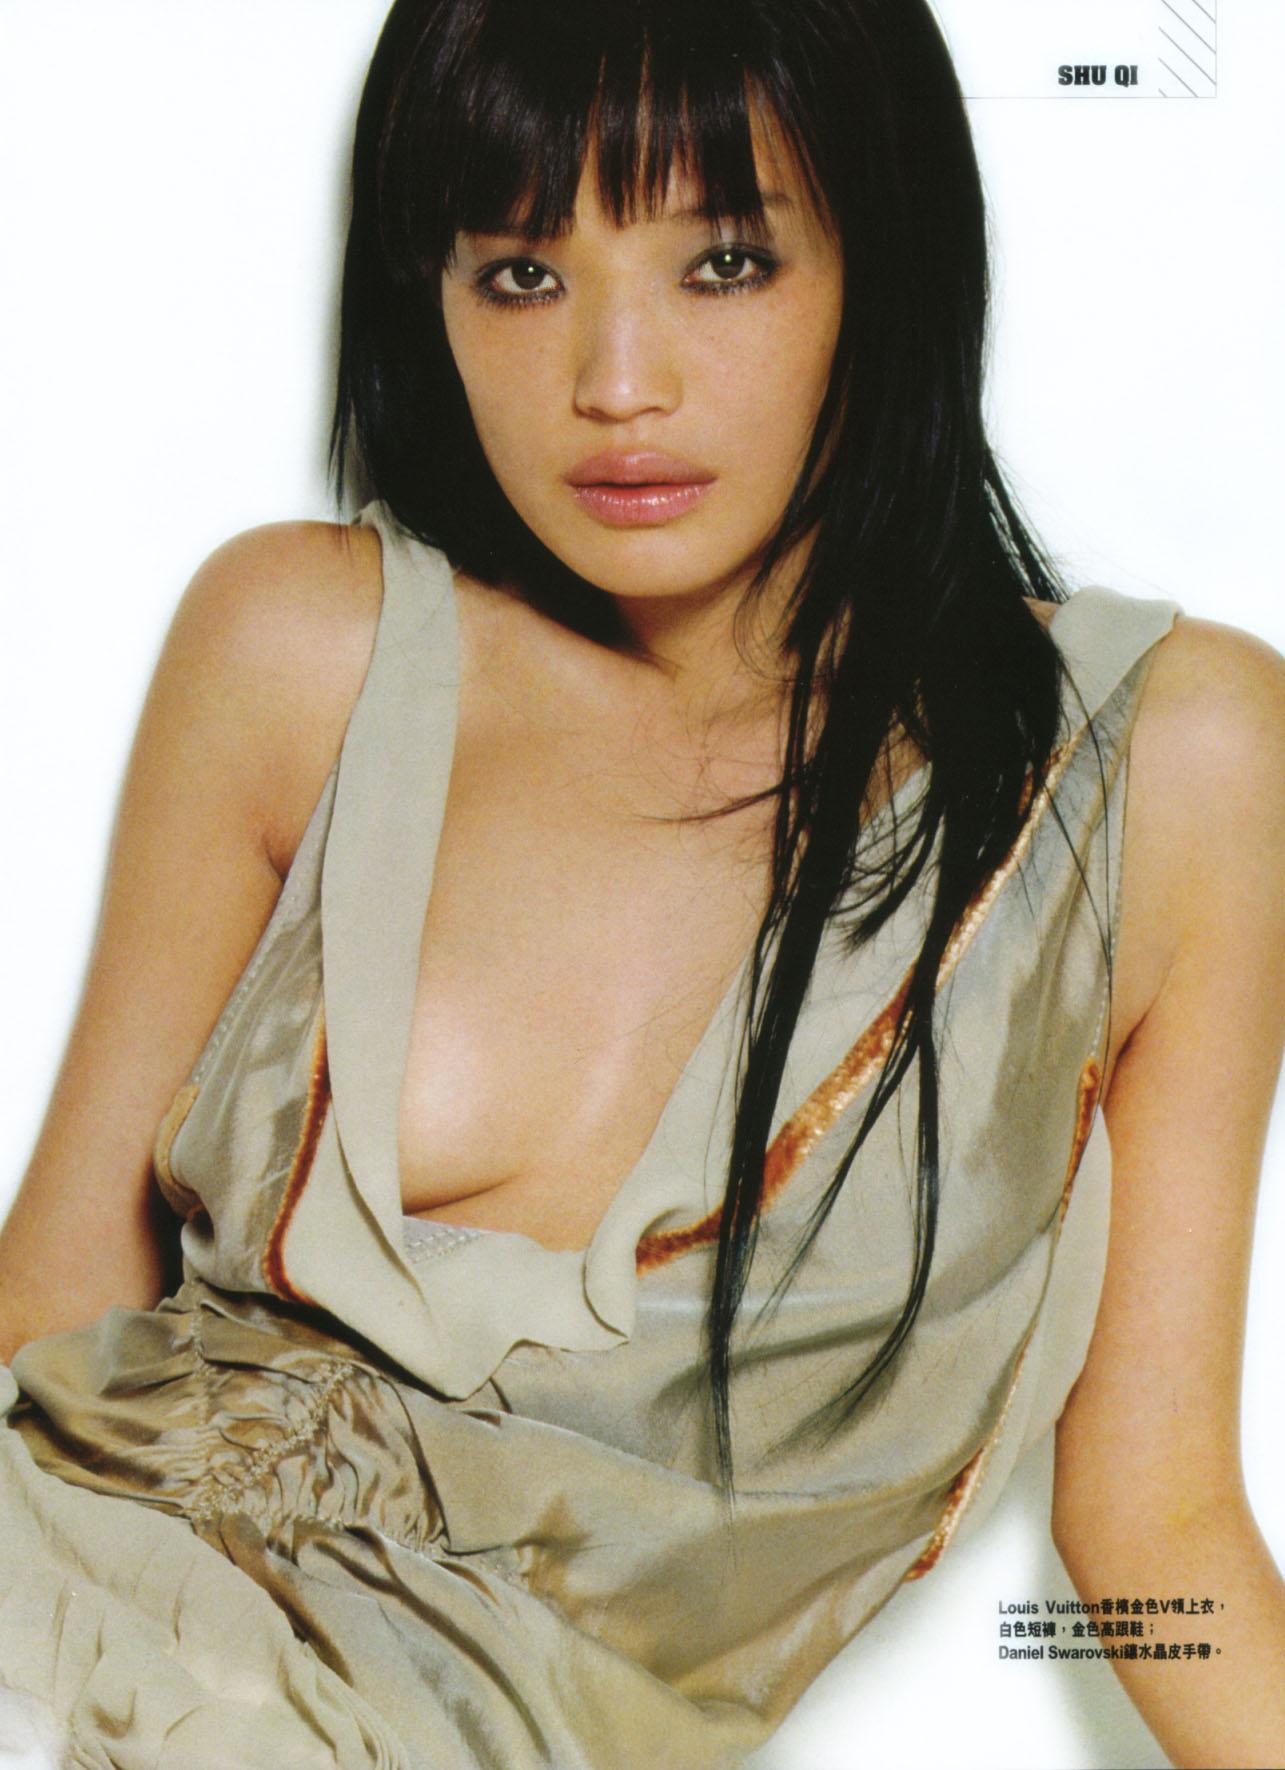 Shu Qi photo, pics, wallpaper - photo #